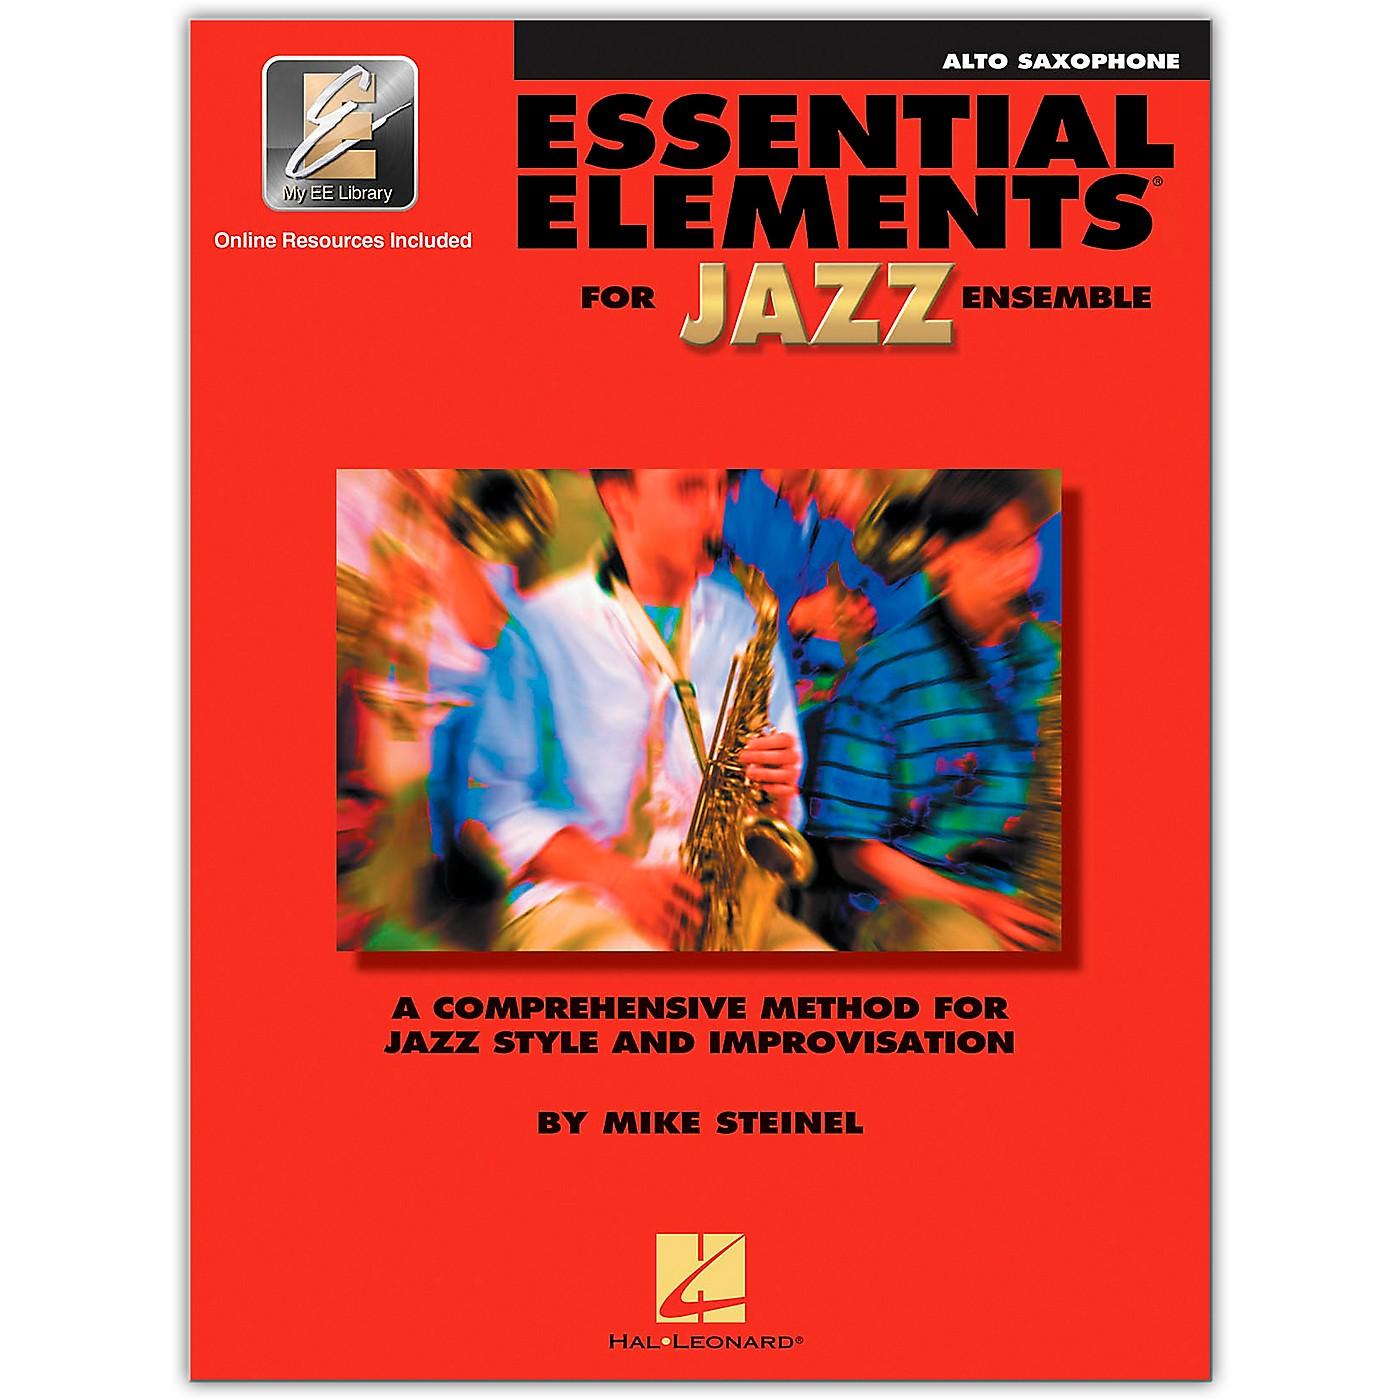 Hal Leonard Essential Elements for Jazz Ensemble - Eb Alto Saxophone (Book/Online Audio) thumbnail